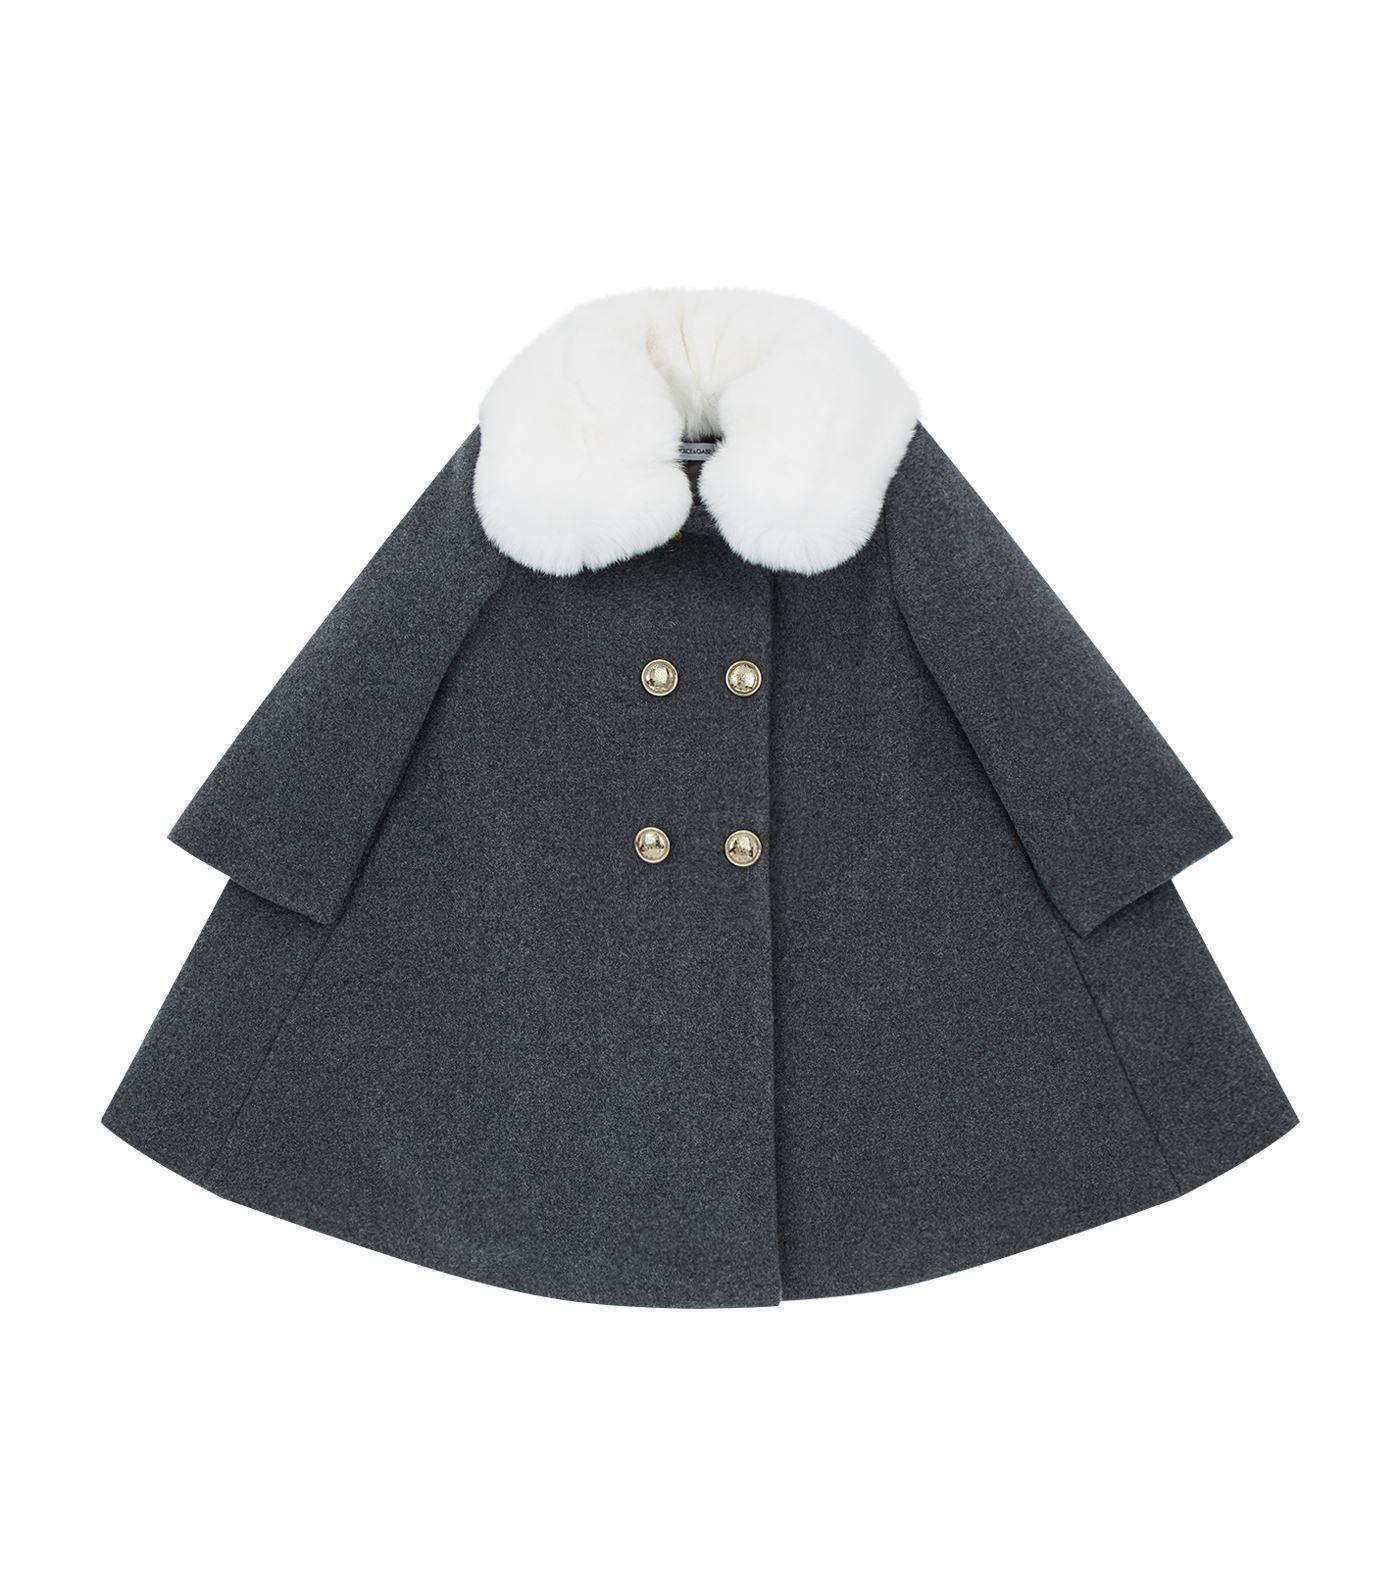 Dolce & Gabbana Double-breasted Fur Collar Coat In Multi